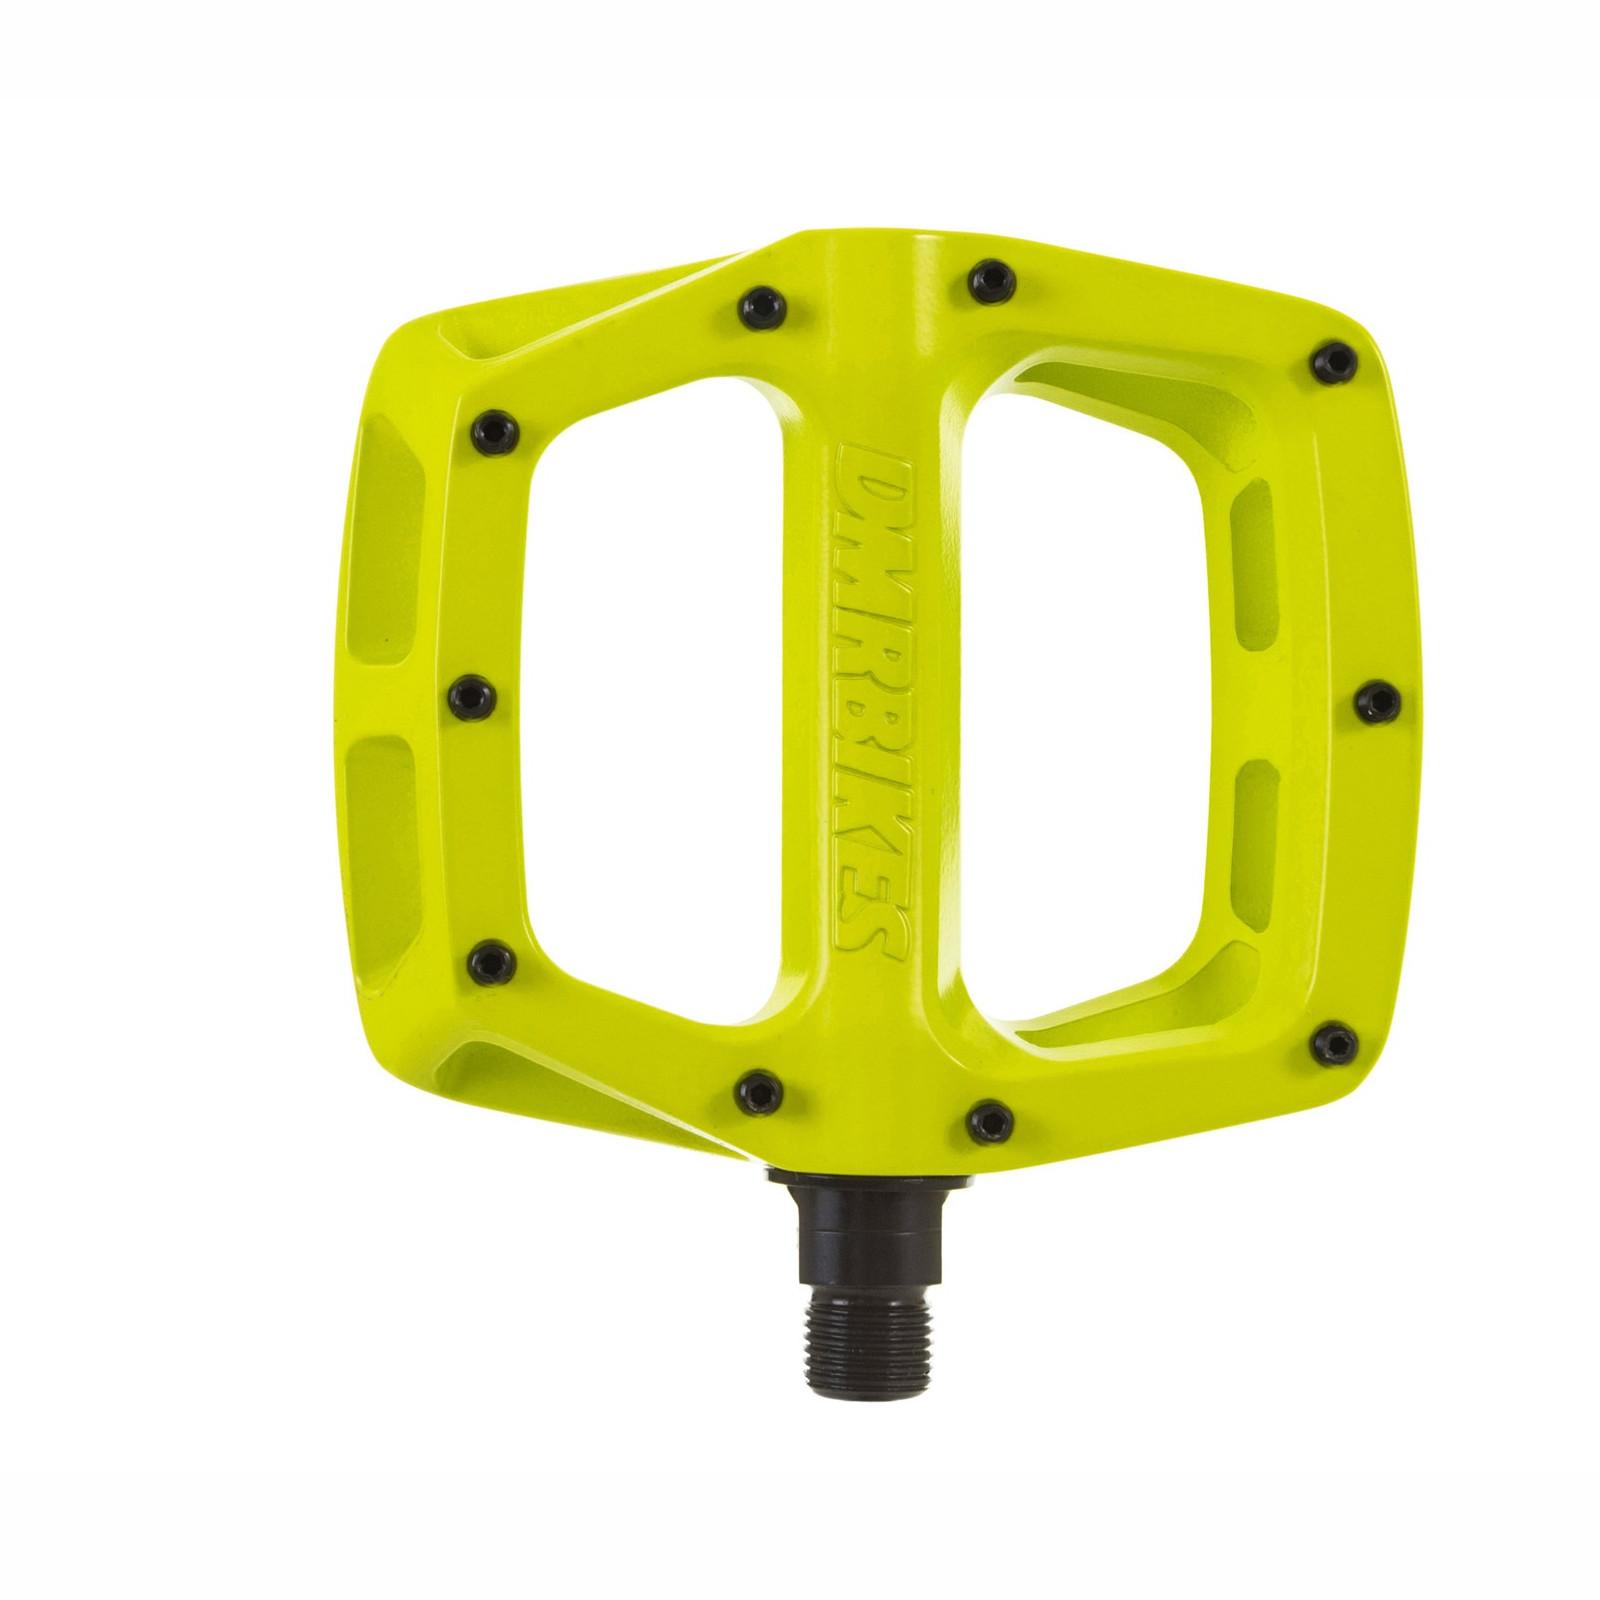 New-Upgraded-Dmr-V8-Lightweight-Flat-Platform-Bike-Pedals-9-16-034 thumbnail 8